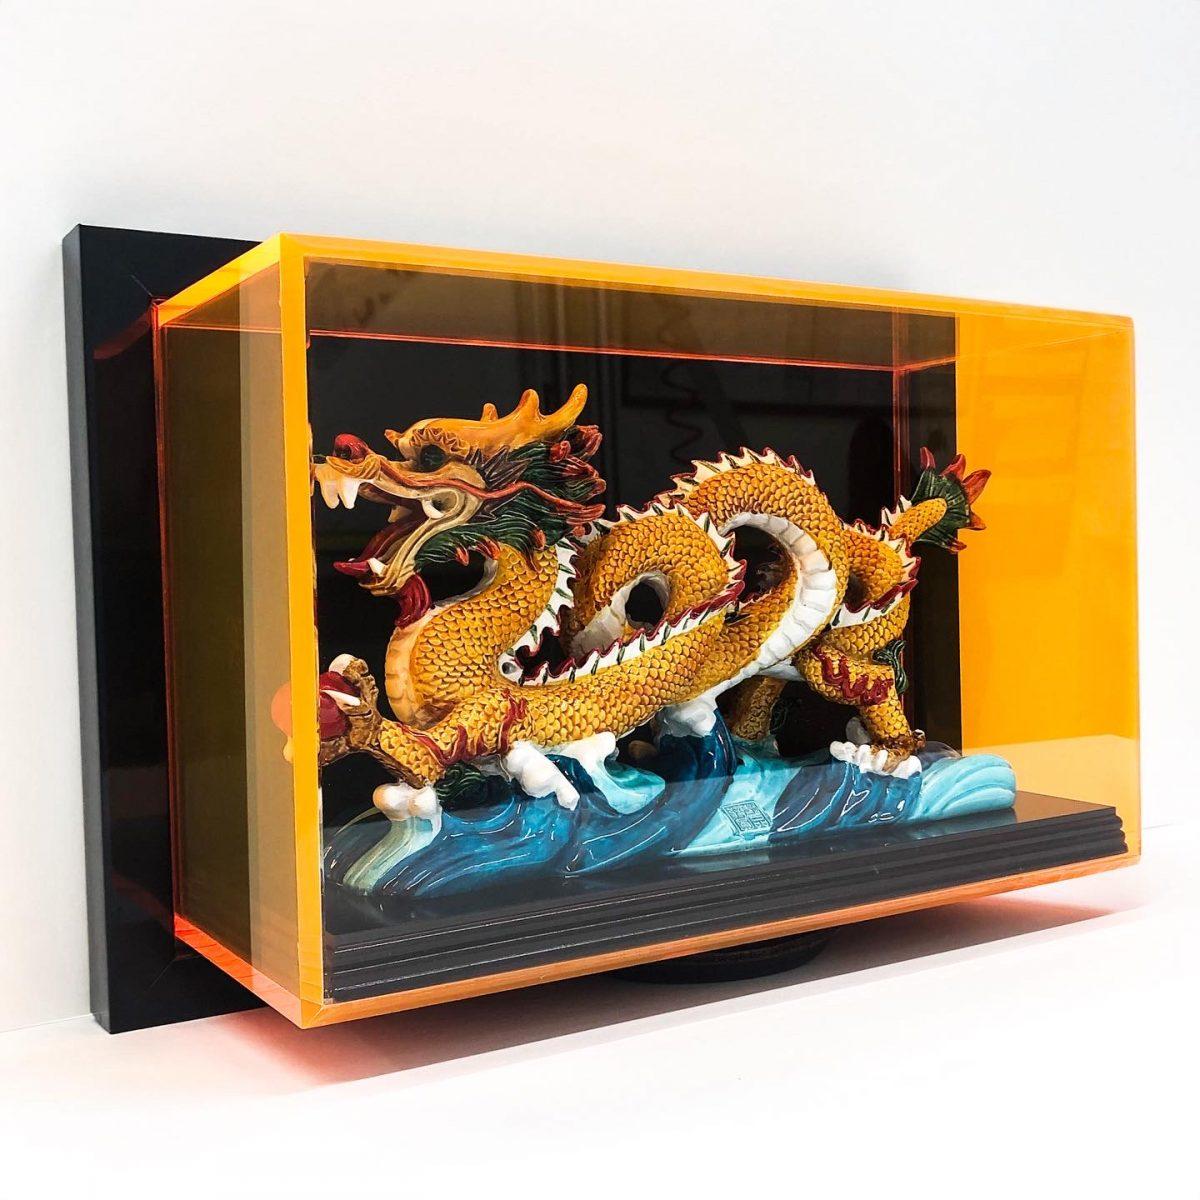 Acrylic Display Case photo